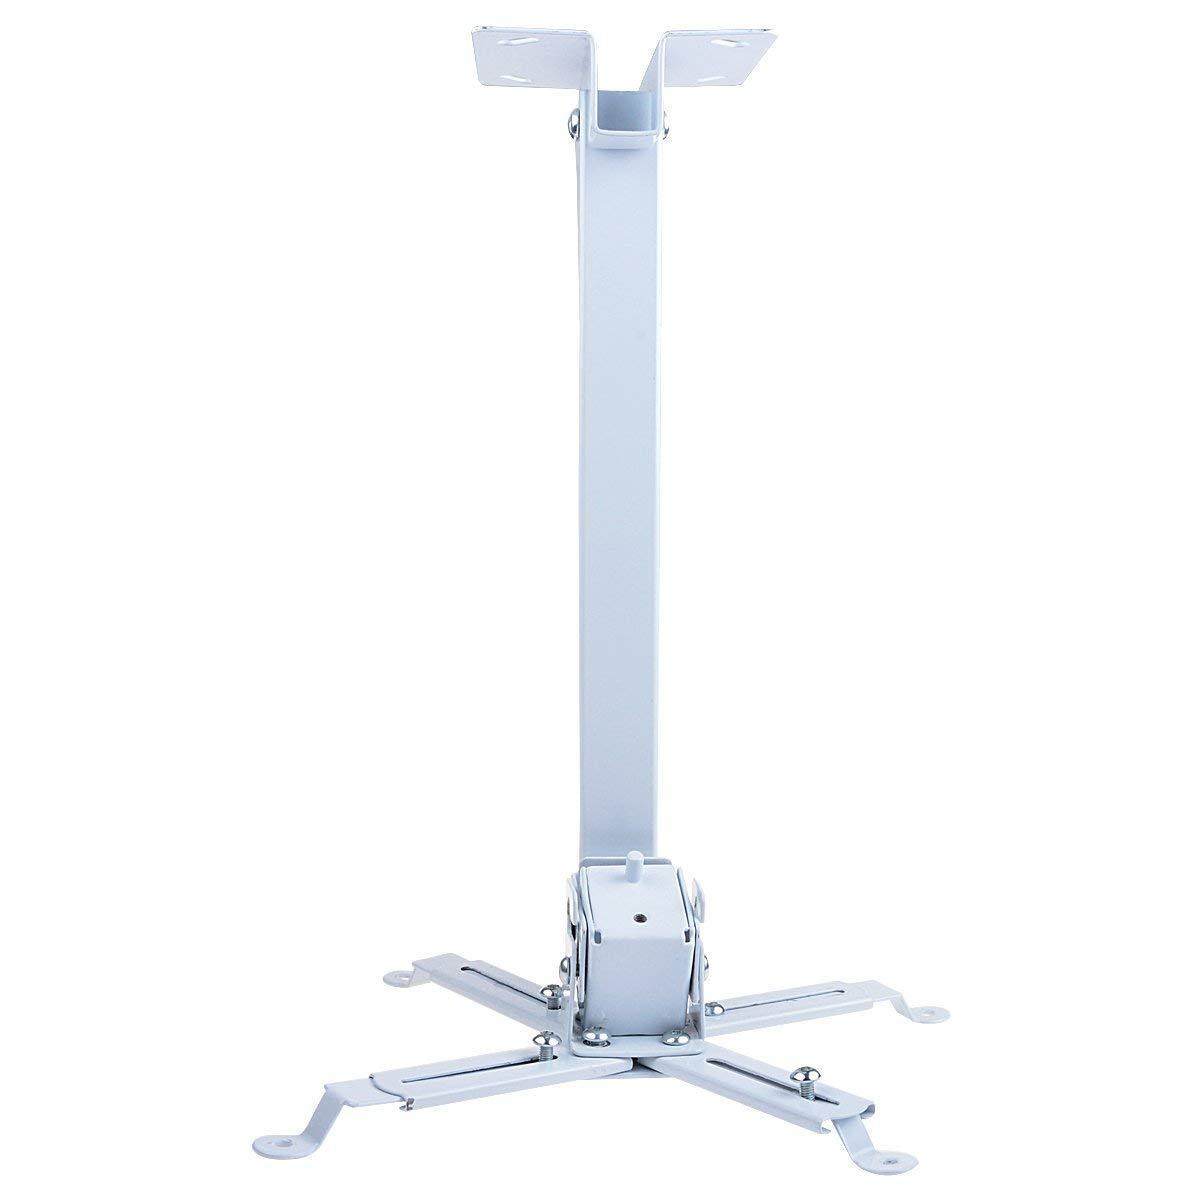 Потолочный кронштейн Charmount PDS08 (крепление, крепёж) для проектора. Длина 430-650мм, нагрузка до 20кг, фото 1